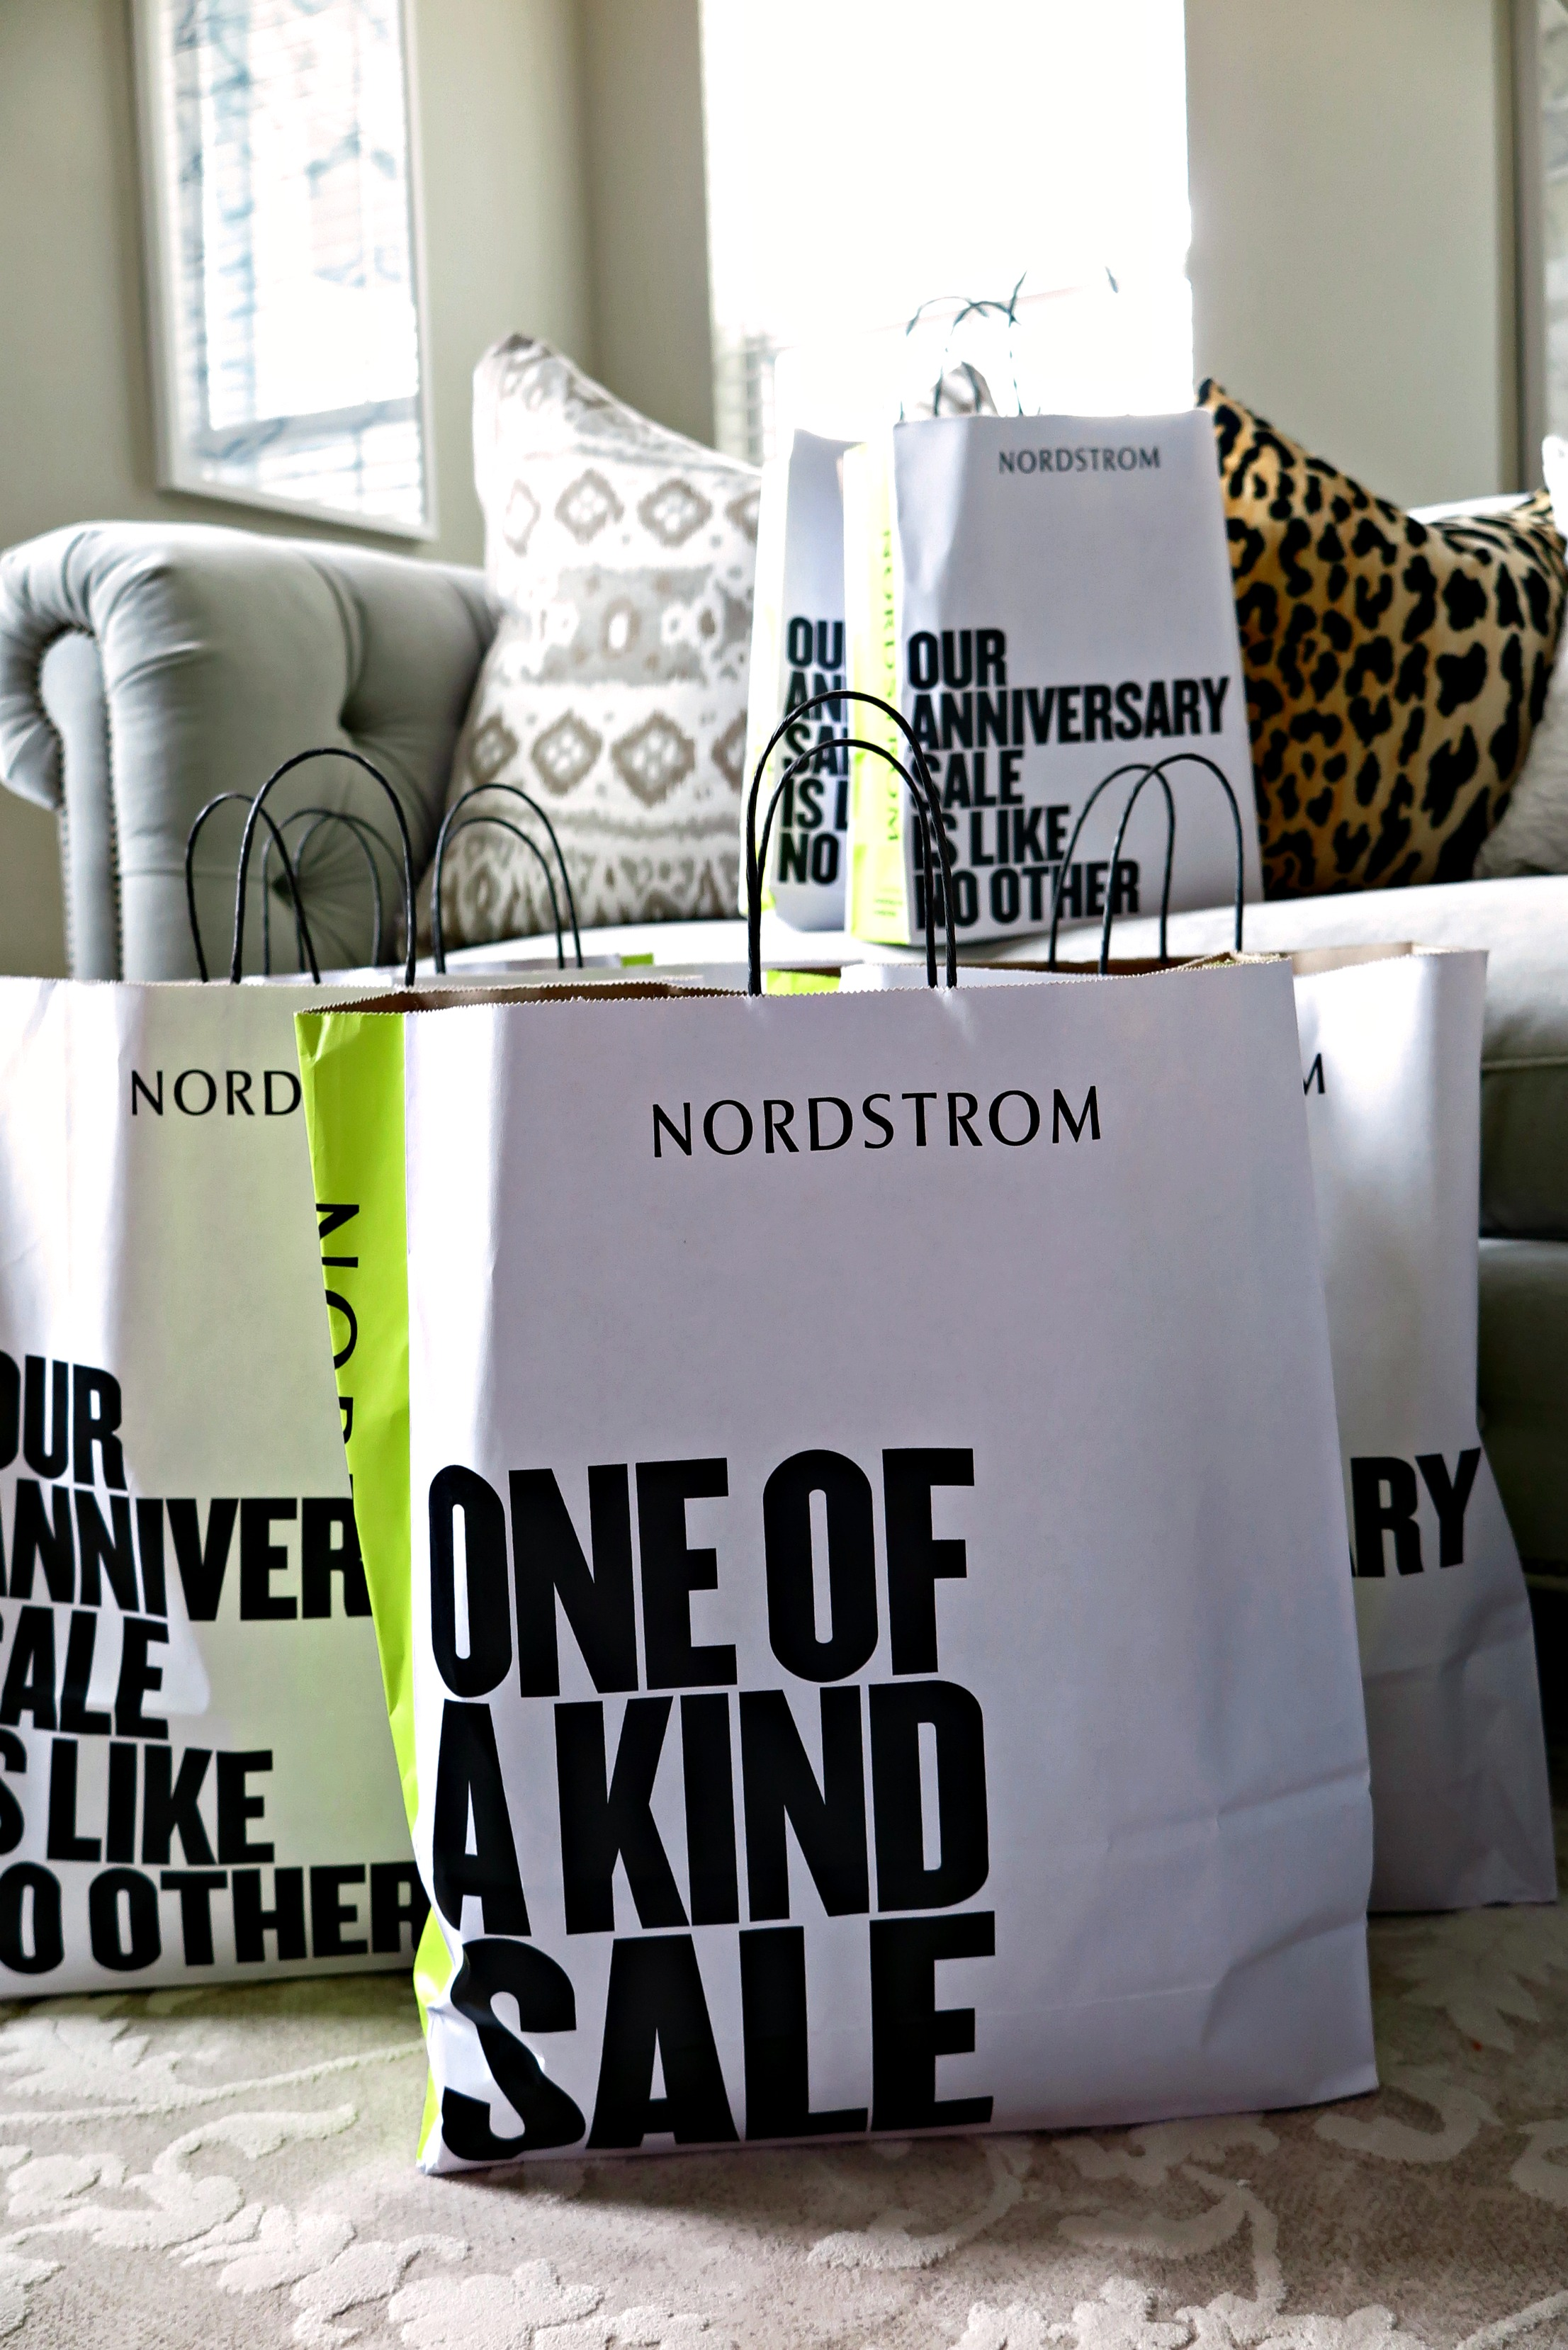 nordstrom anniversary sale, nordstrom sale, nordstrom